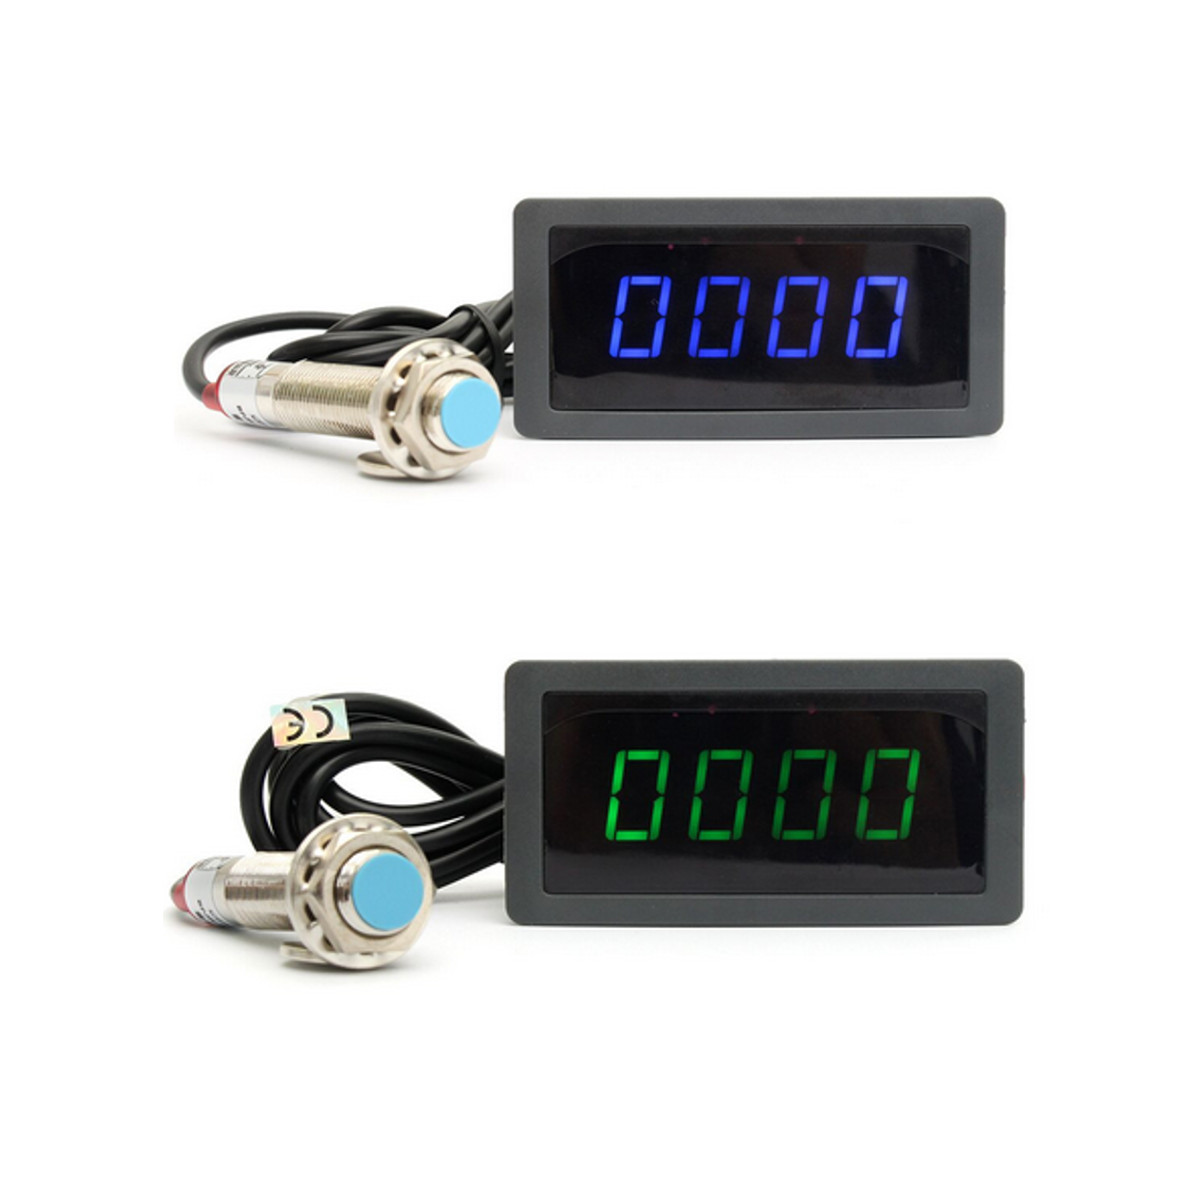 Blau Grün 4 Digitale LED Tachometer RPM Geschwindigkeit Meter + Proximity Schalter Sensor 12 v Förderung